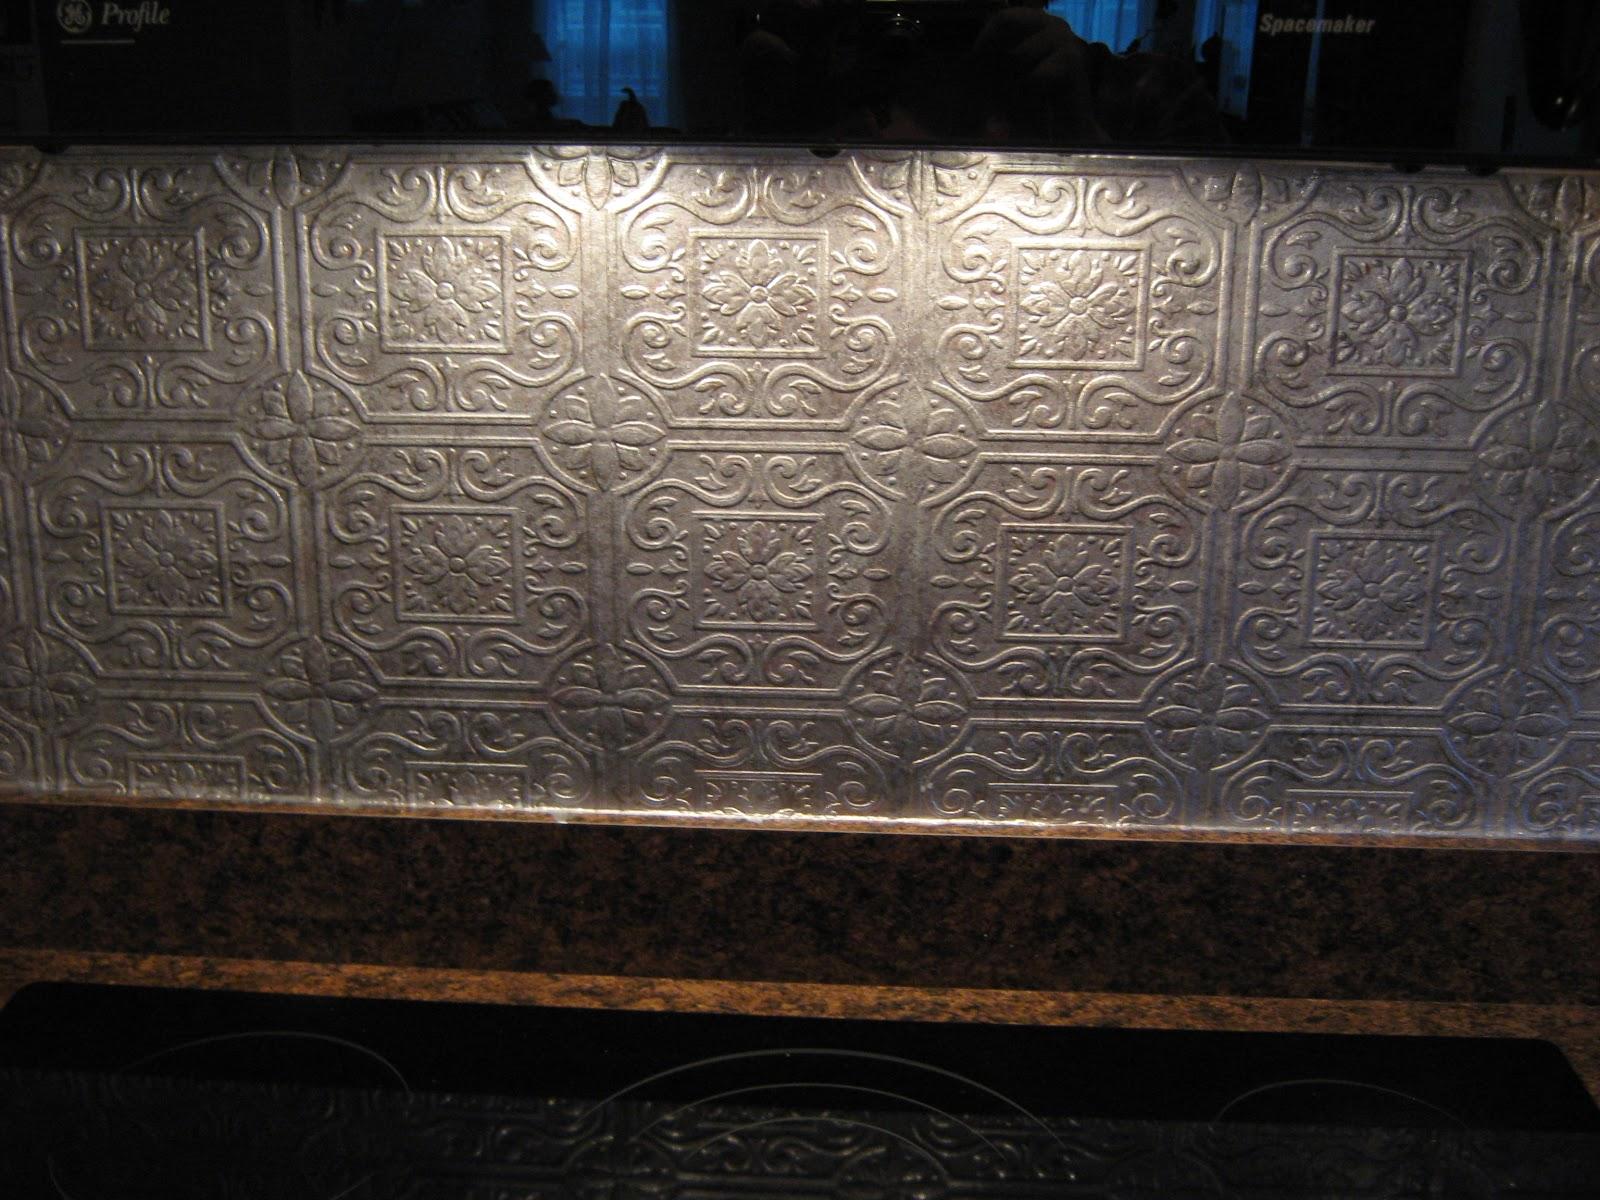 - 48+] Wallpaper That Looks Like Metal On WallpaperSafari